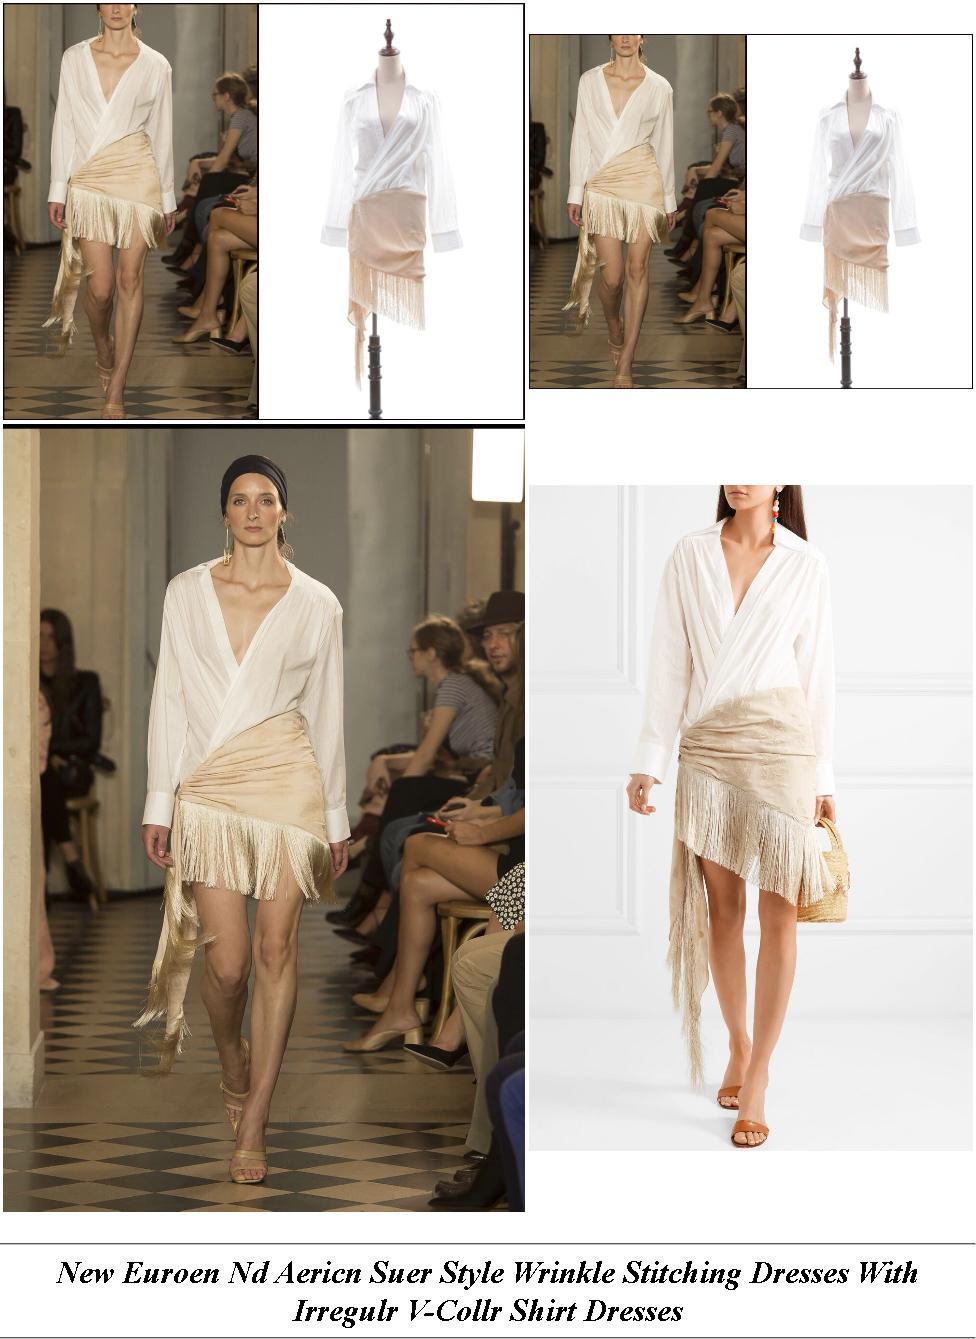 Dress The Dress - Est Womens Clothing Amazon - Occasion Wear Ireland